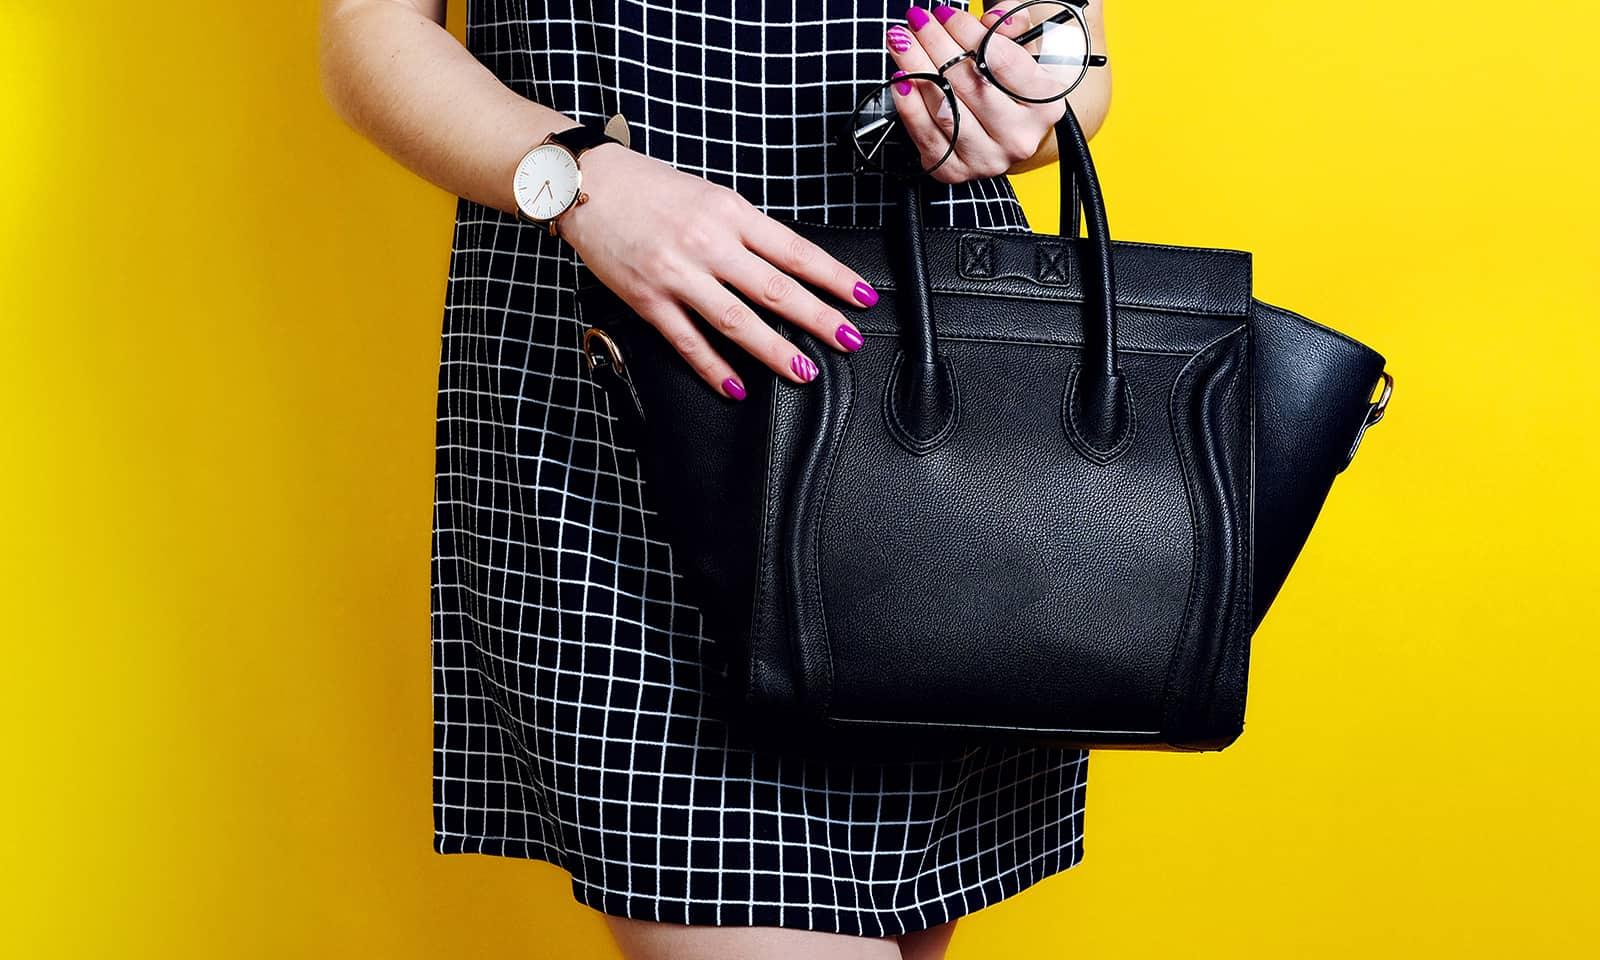 viva-glams-favorite-black-luxury-handbags-vegan-bags-stella-black-by-voni